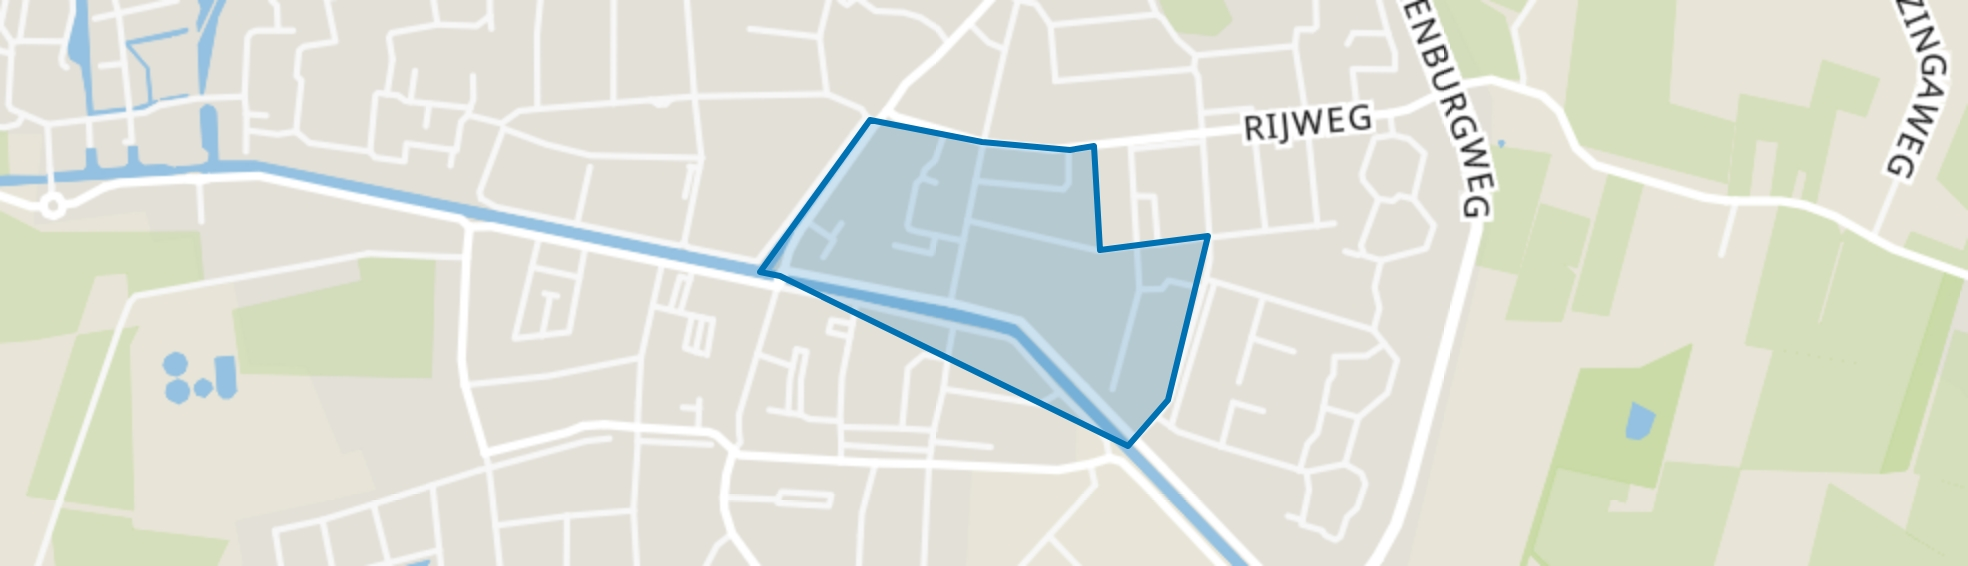 Oosterwolde-Centrum-Noord-Oost, Oosterwolde (FR) map